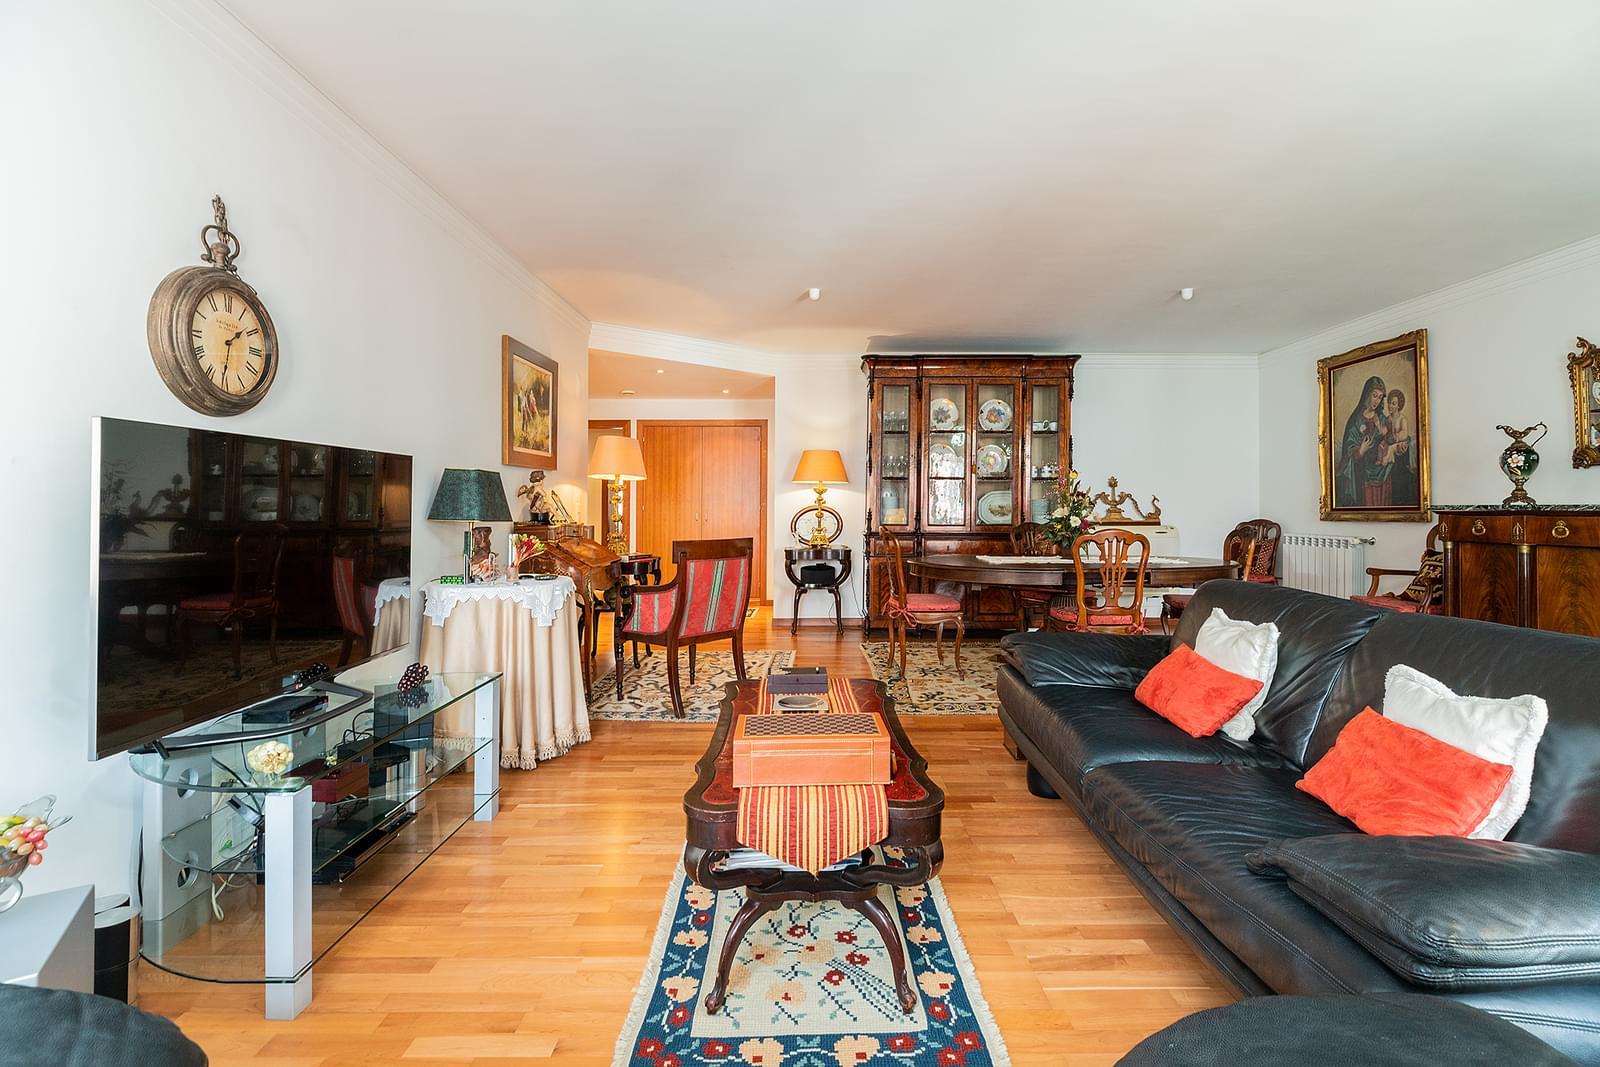 pf18049-apartamento-t3-lisboa-fe031aac-42ec-4c6b-a2b9-21d65ce9b786